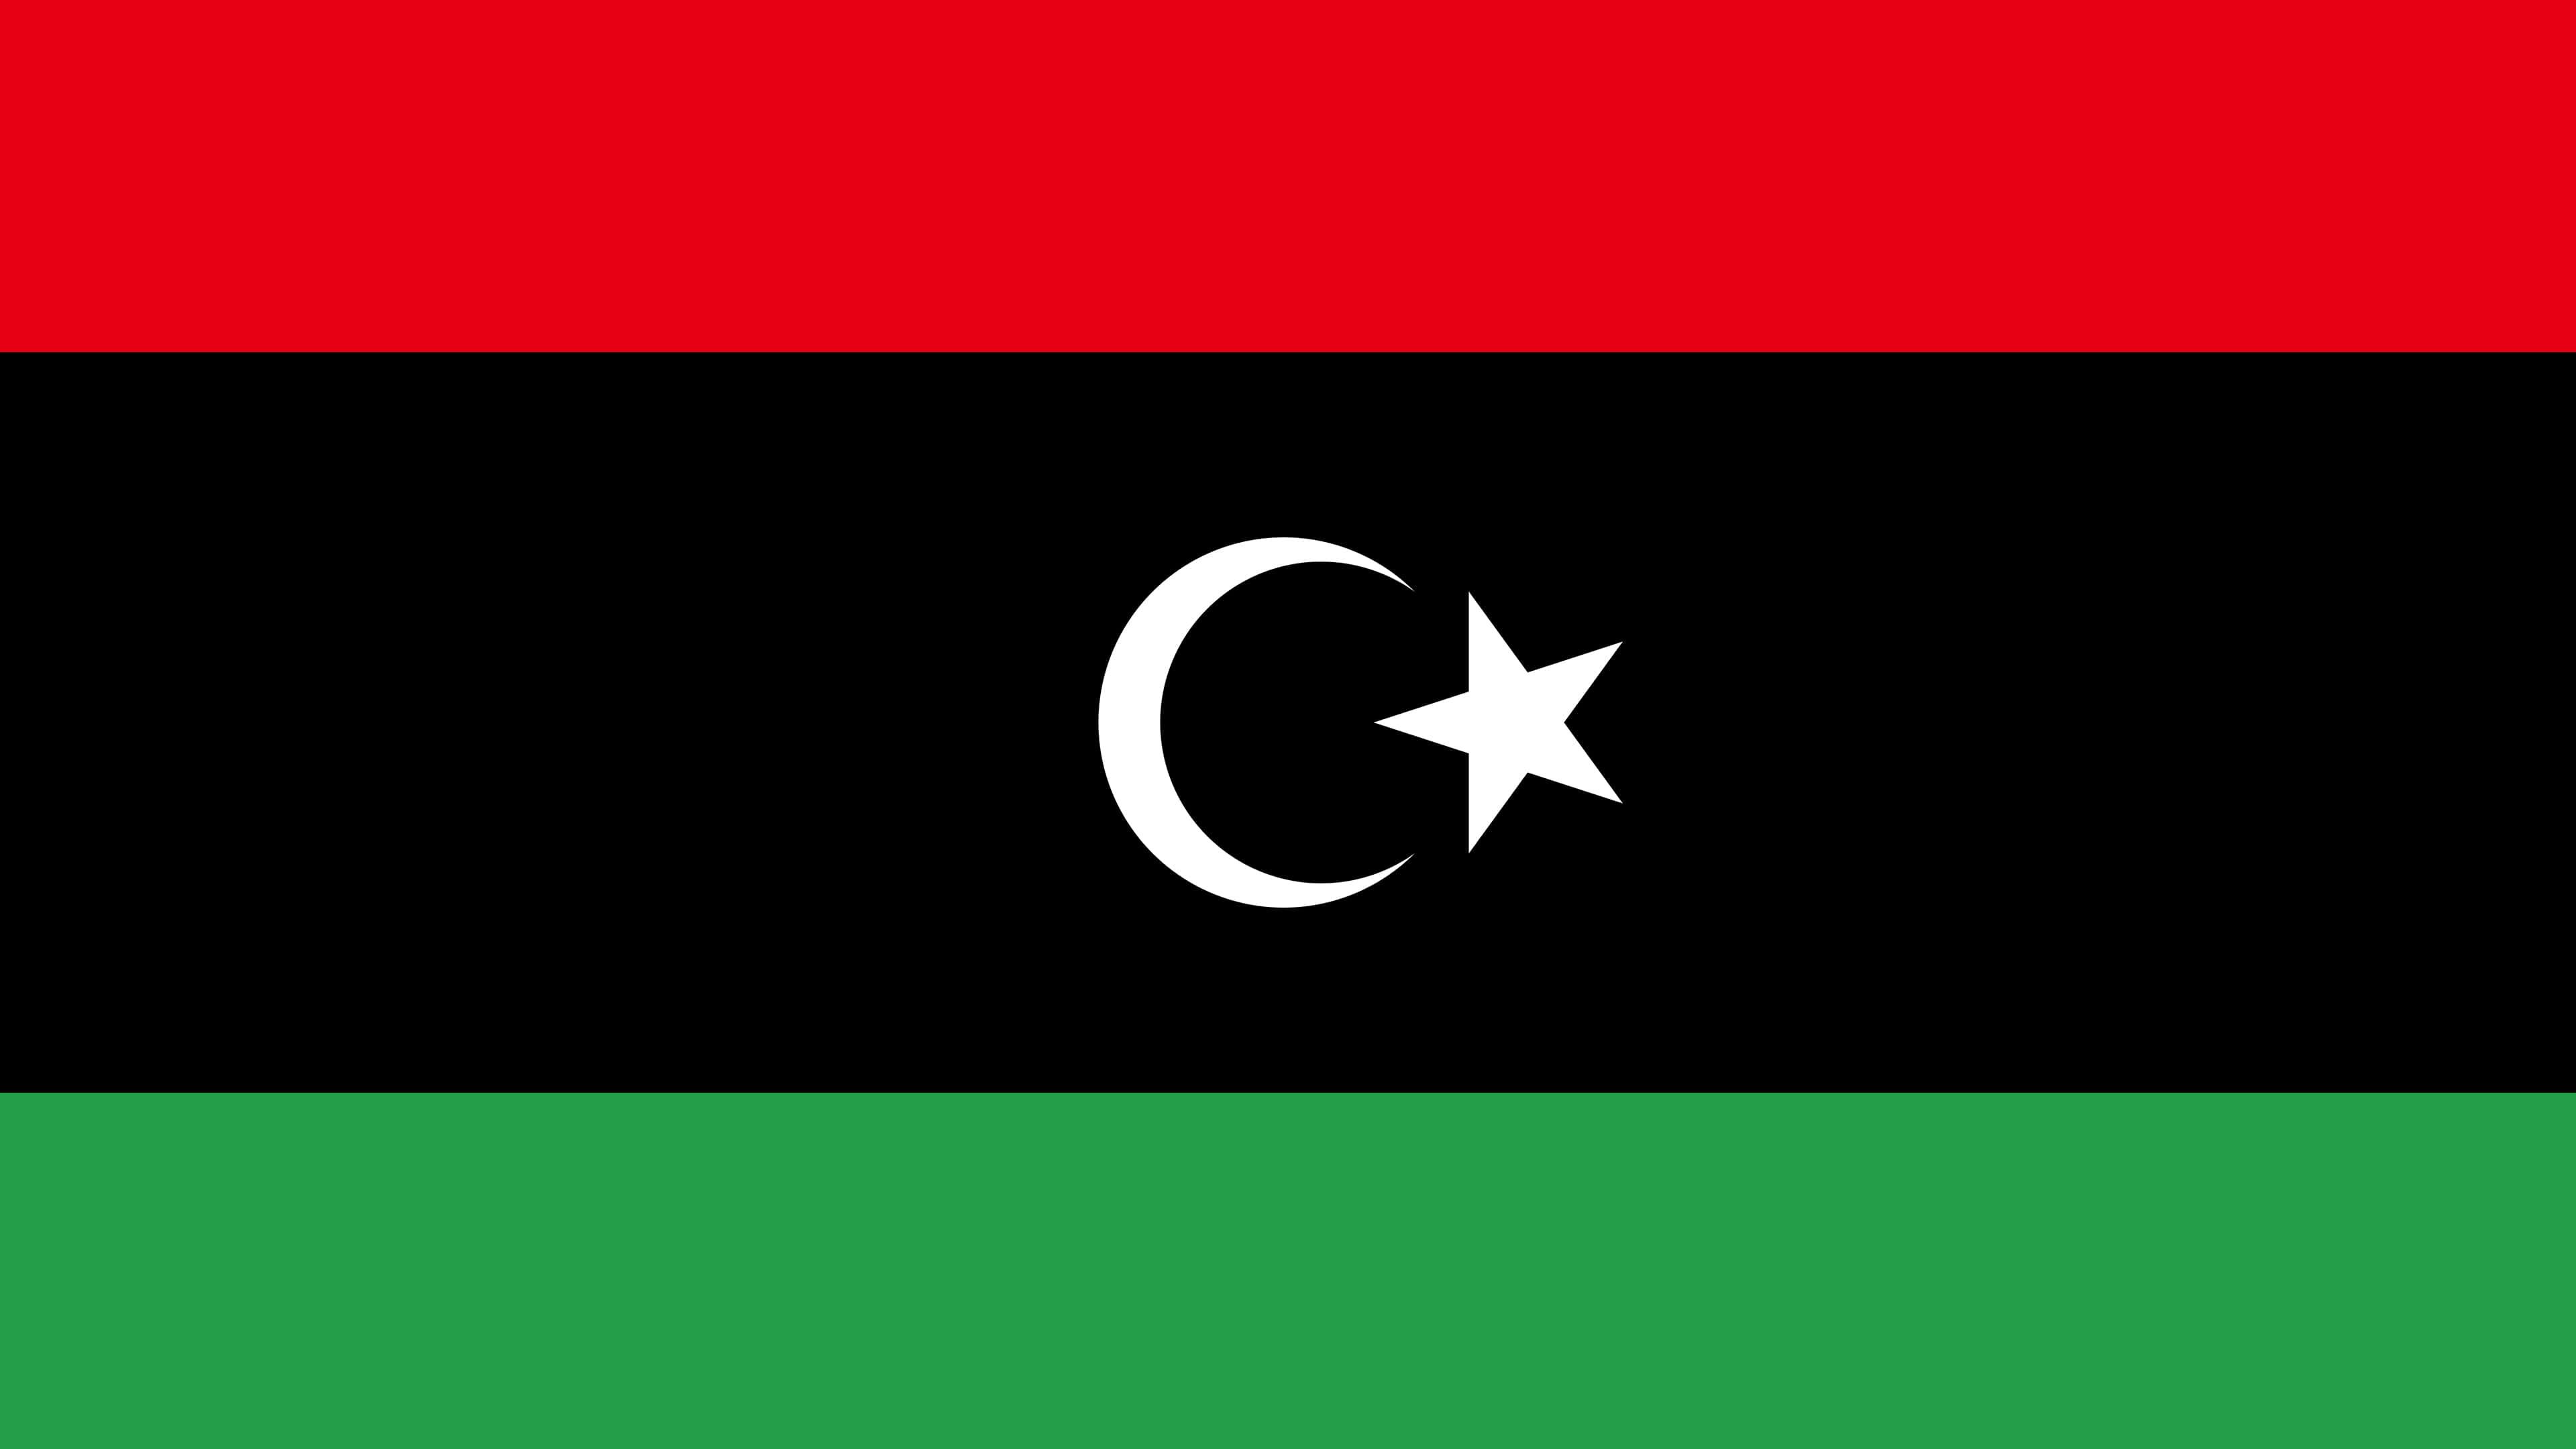 libya flag uhd 4k wallpaper